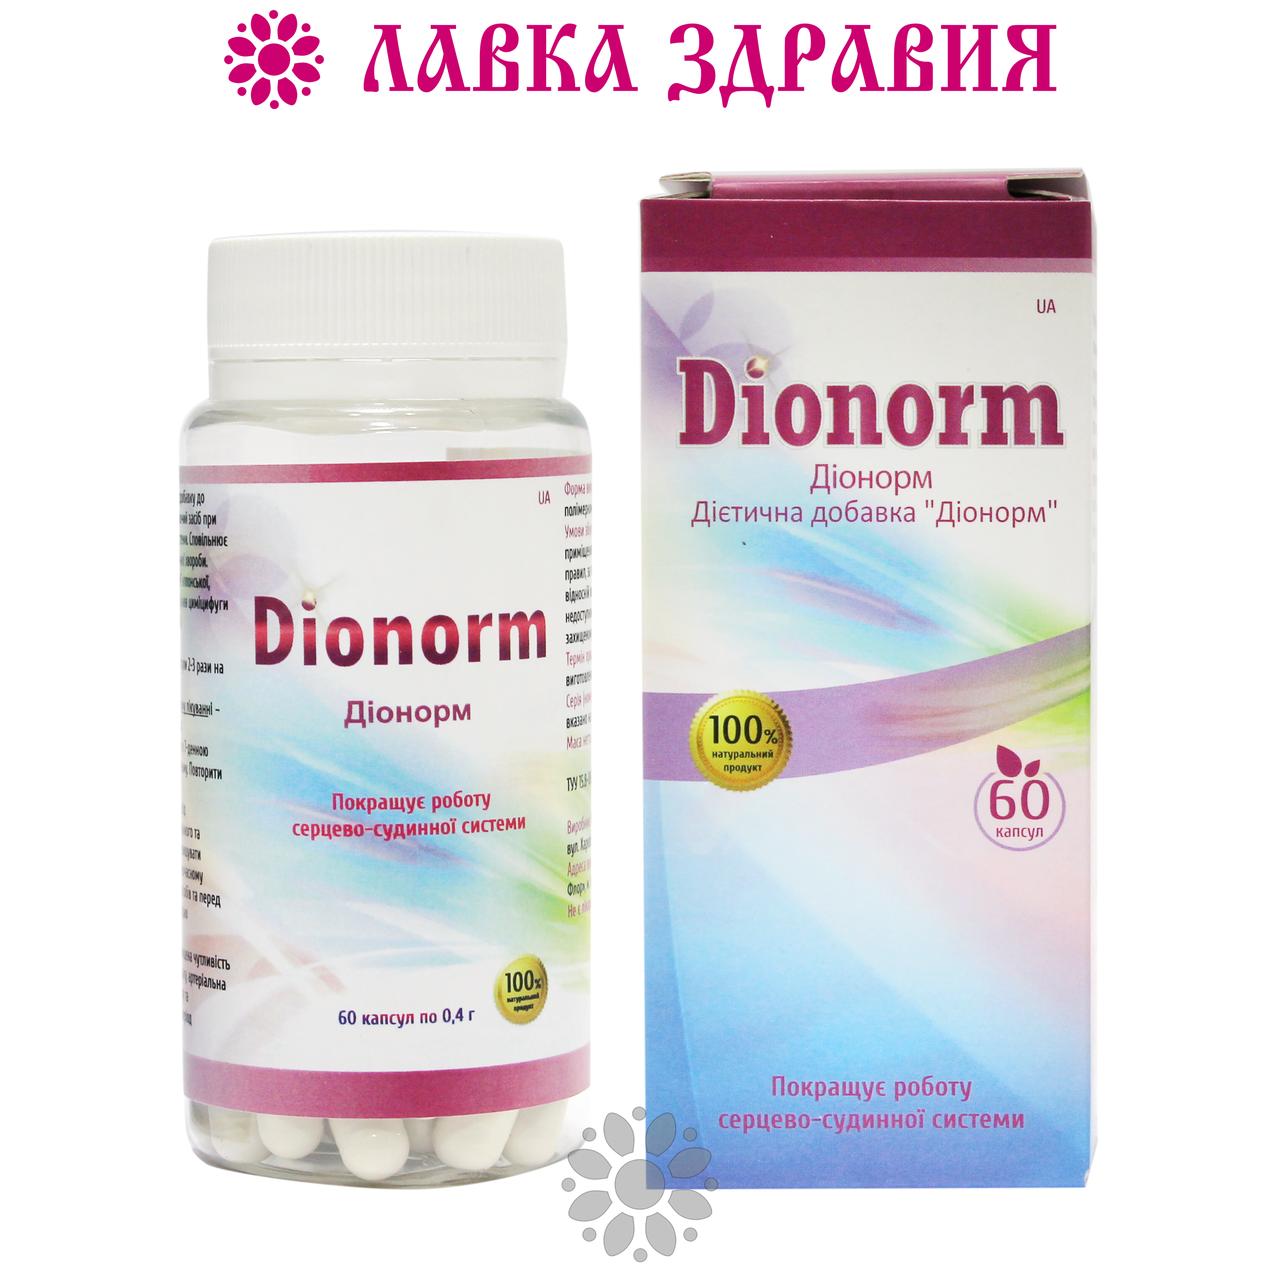 Дионорм - нормализация давления, 60 капс, Уссури